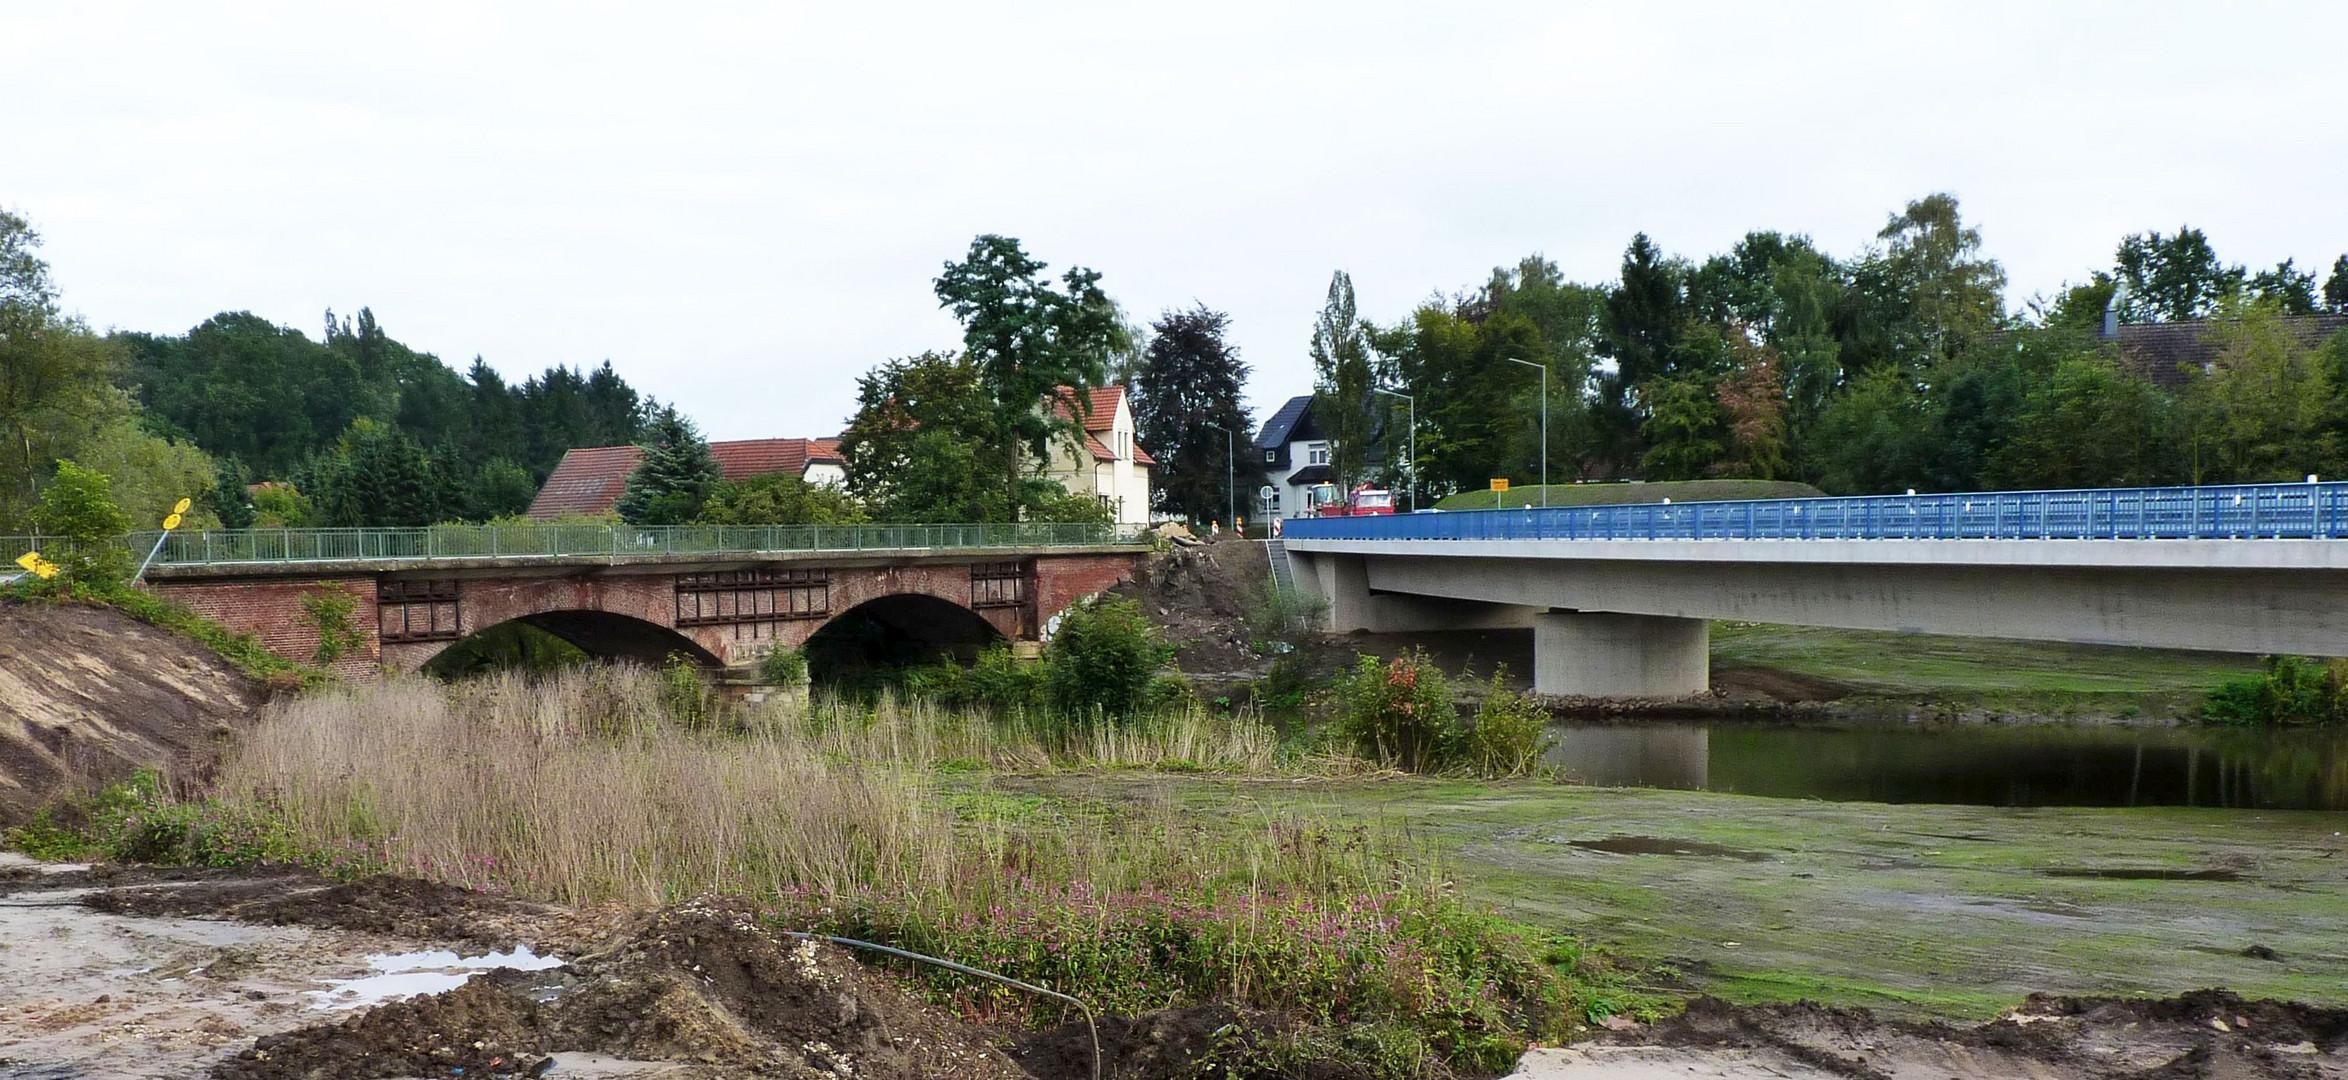 Oberbehmer Brücke alt+neu